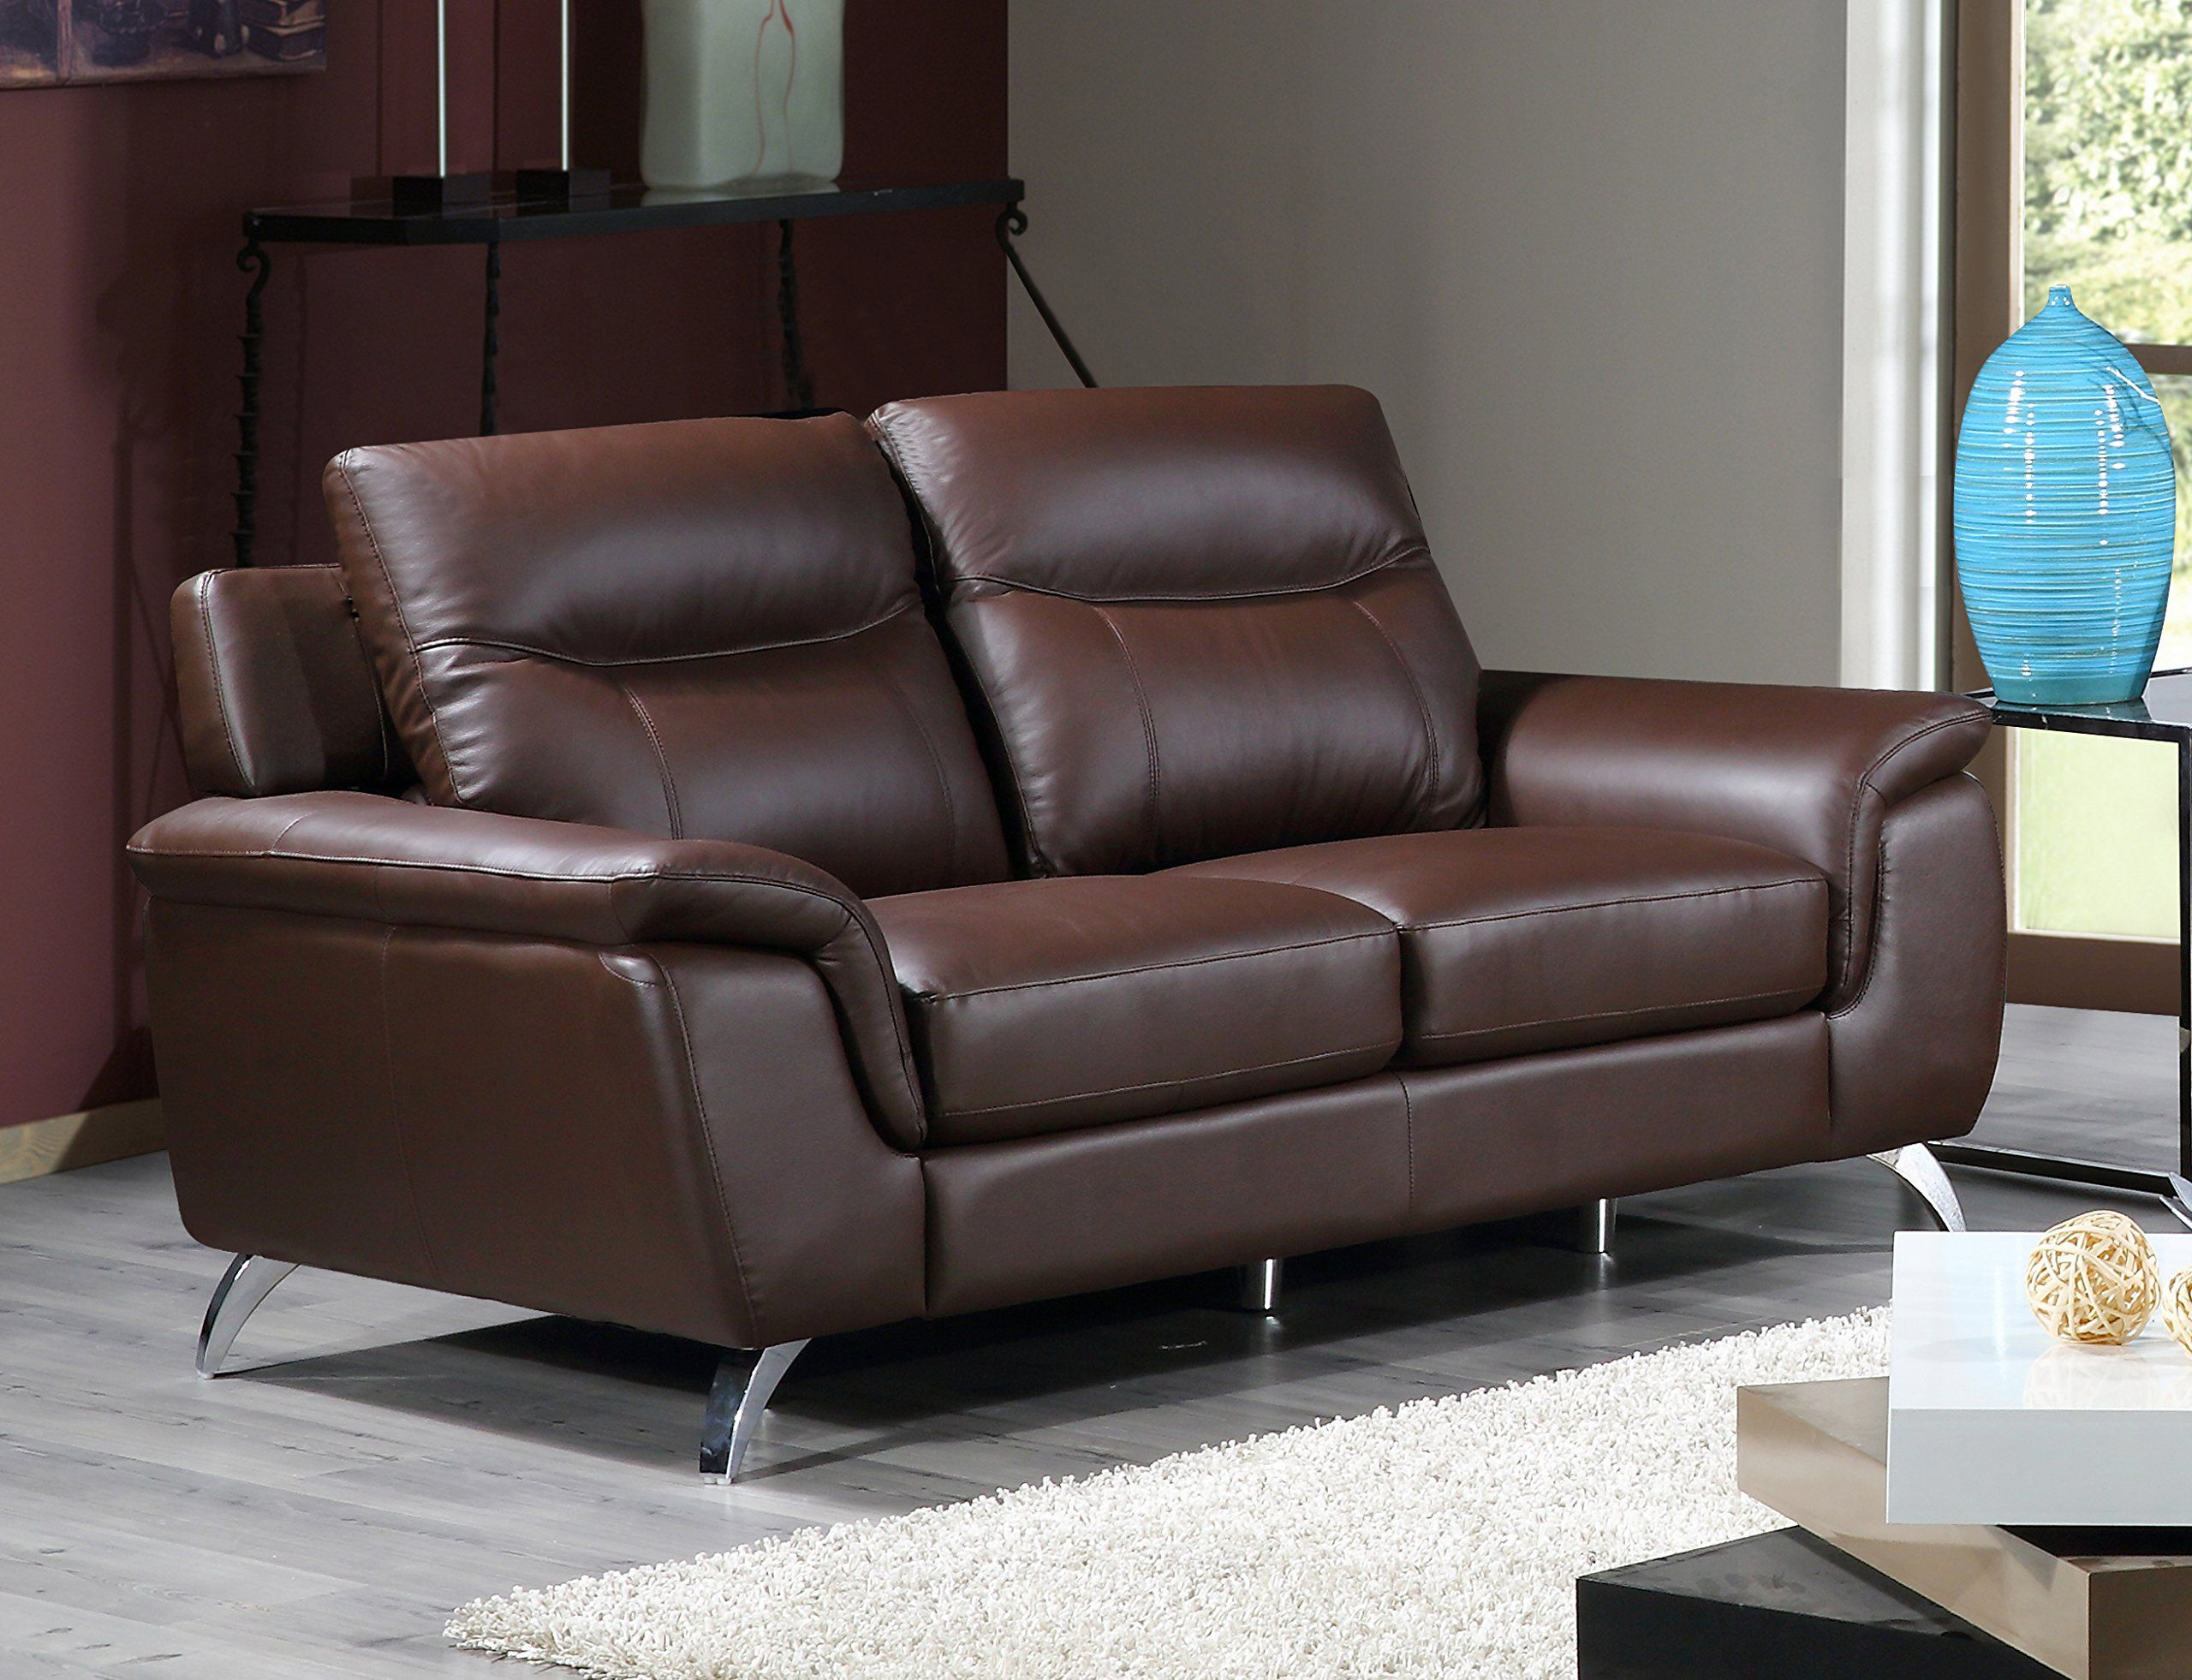 Cortesi Home Chicago Genuine Leather Sofa #Sofa | Sofa ...